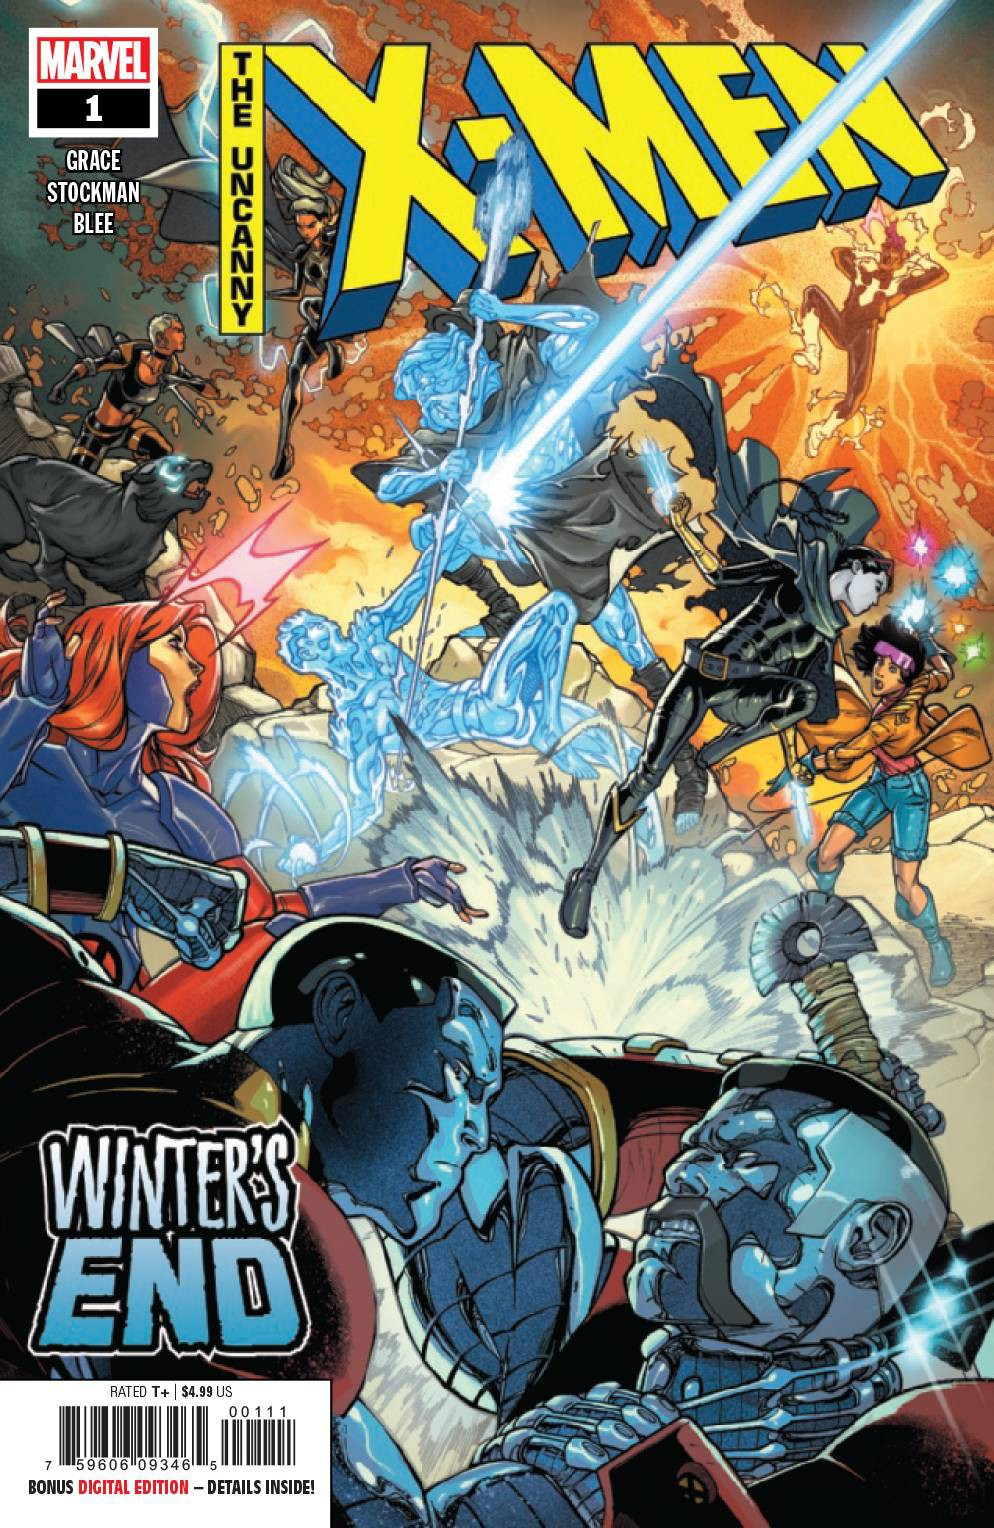 Marvel Uncanny X-Men #1 [Winters End] by